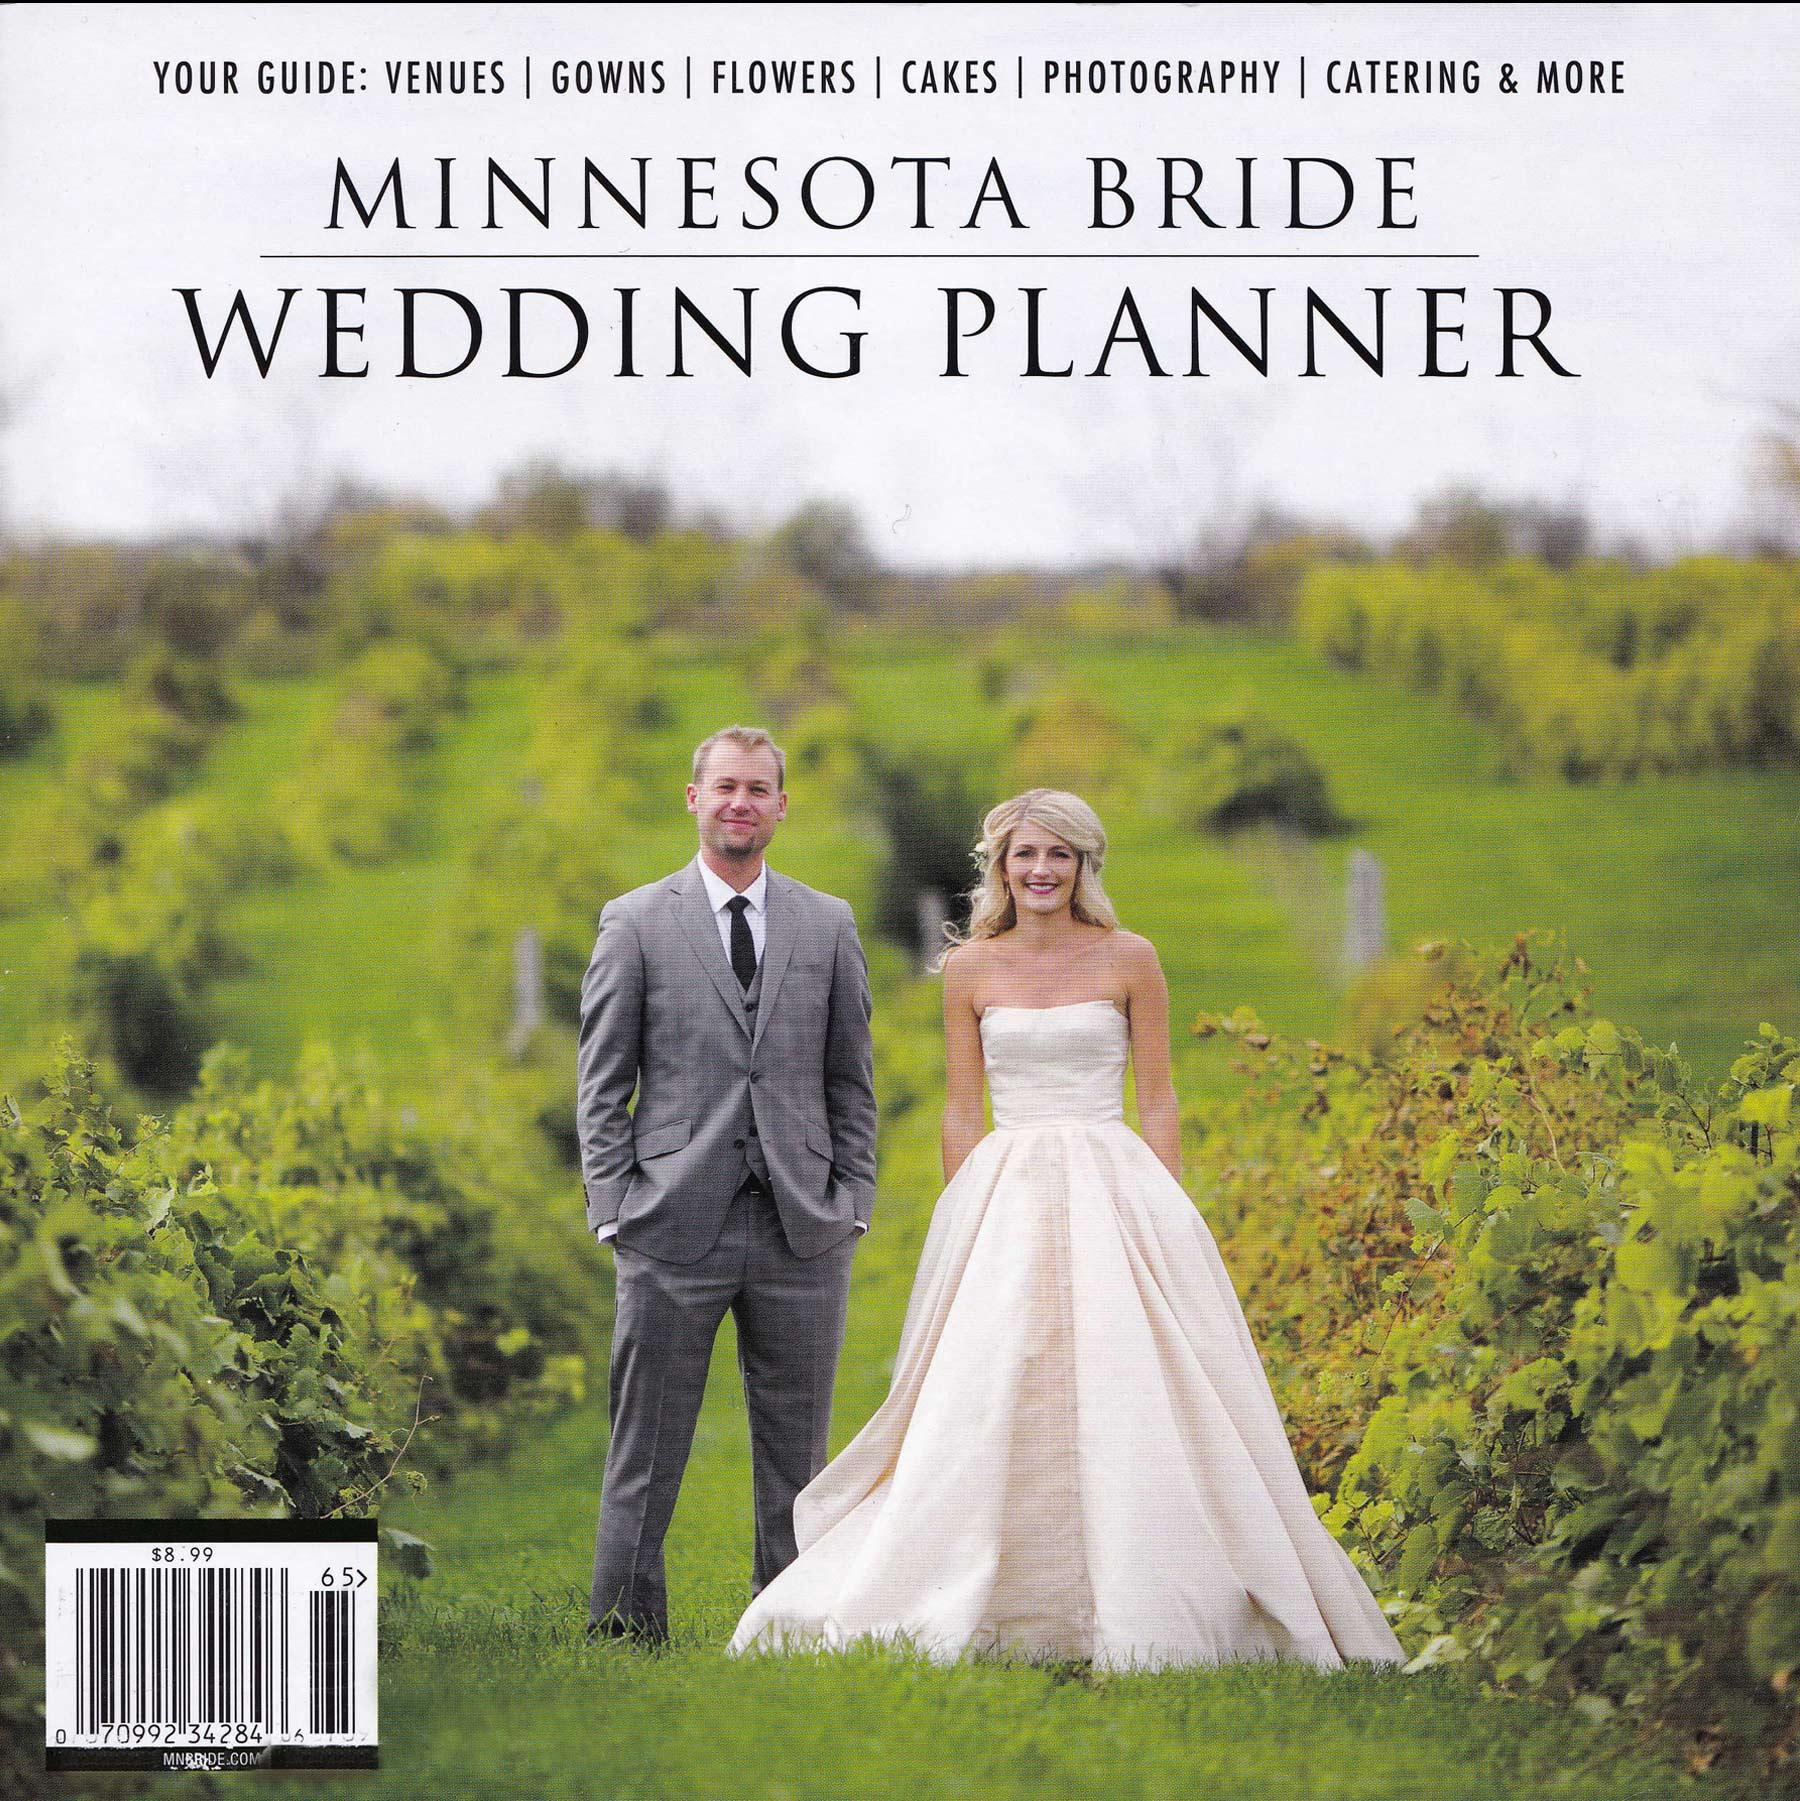 MN-Bride-Planner-2016_01.jpg